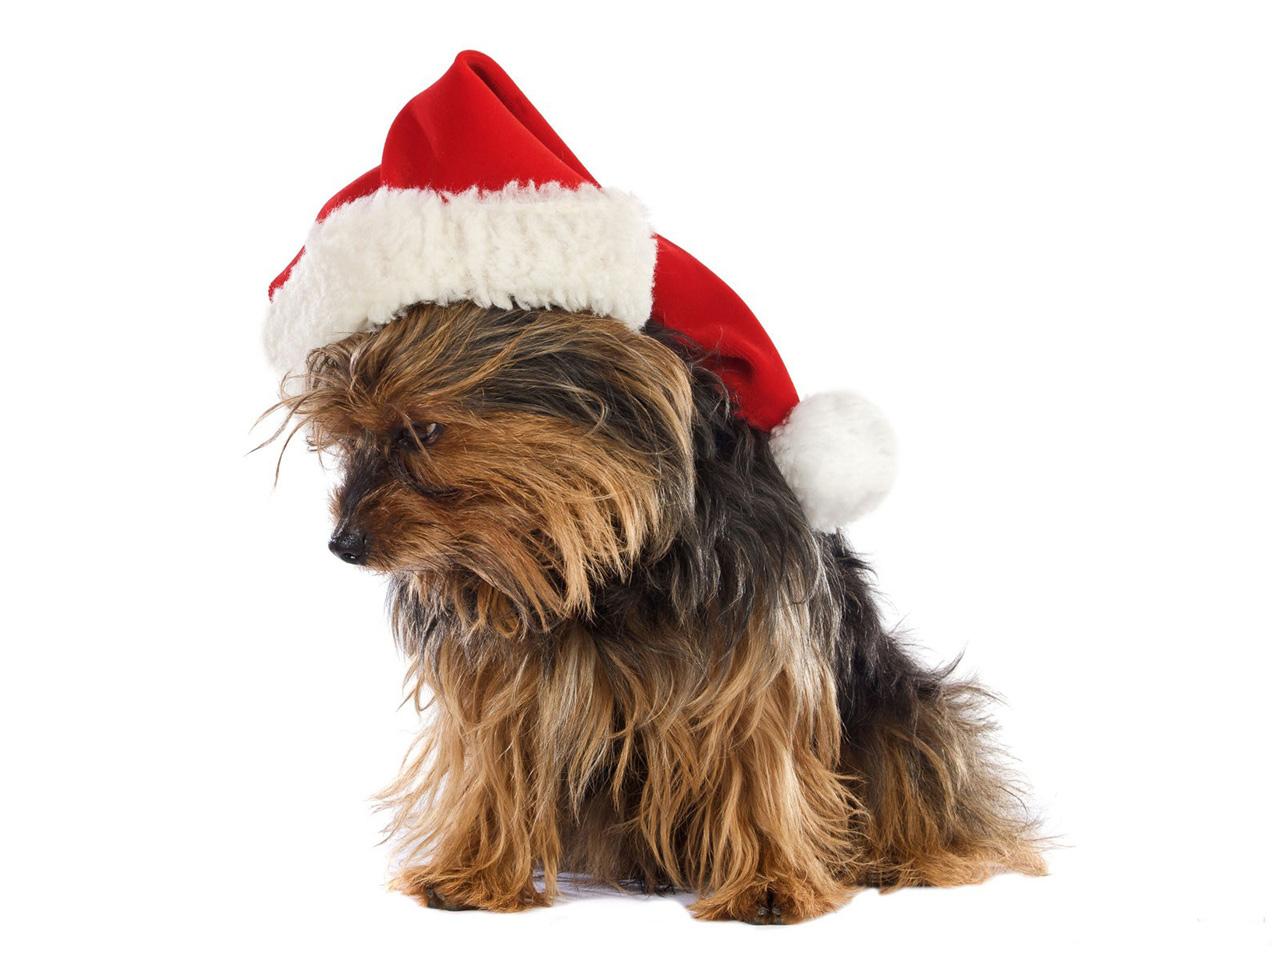 Yorkshire Terrier Puppy Christmas freecomputerdesktopwallpaper 1280 1280x960